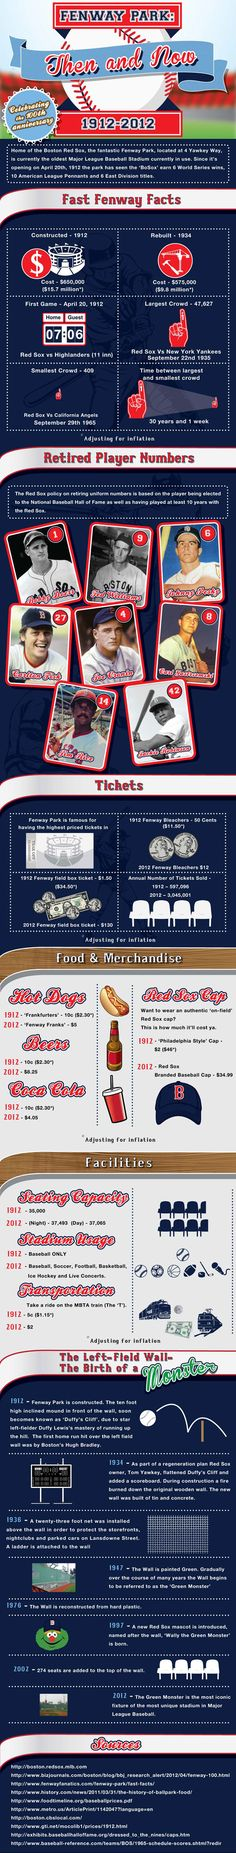 Fun Facts About Fenway Park History - Boston Red Sox Baseball Ballpark